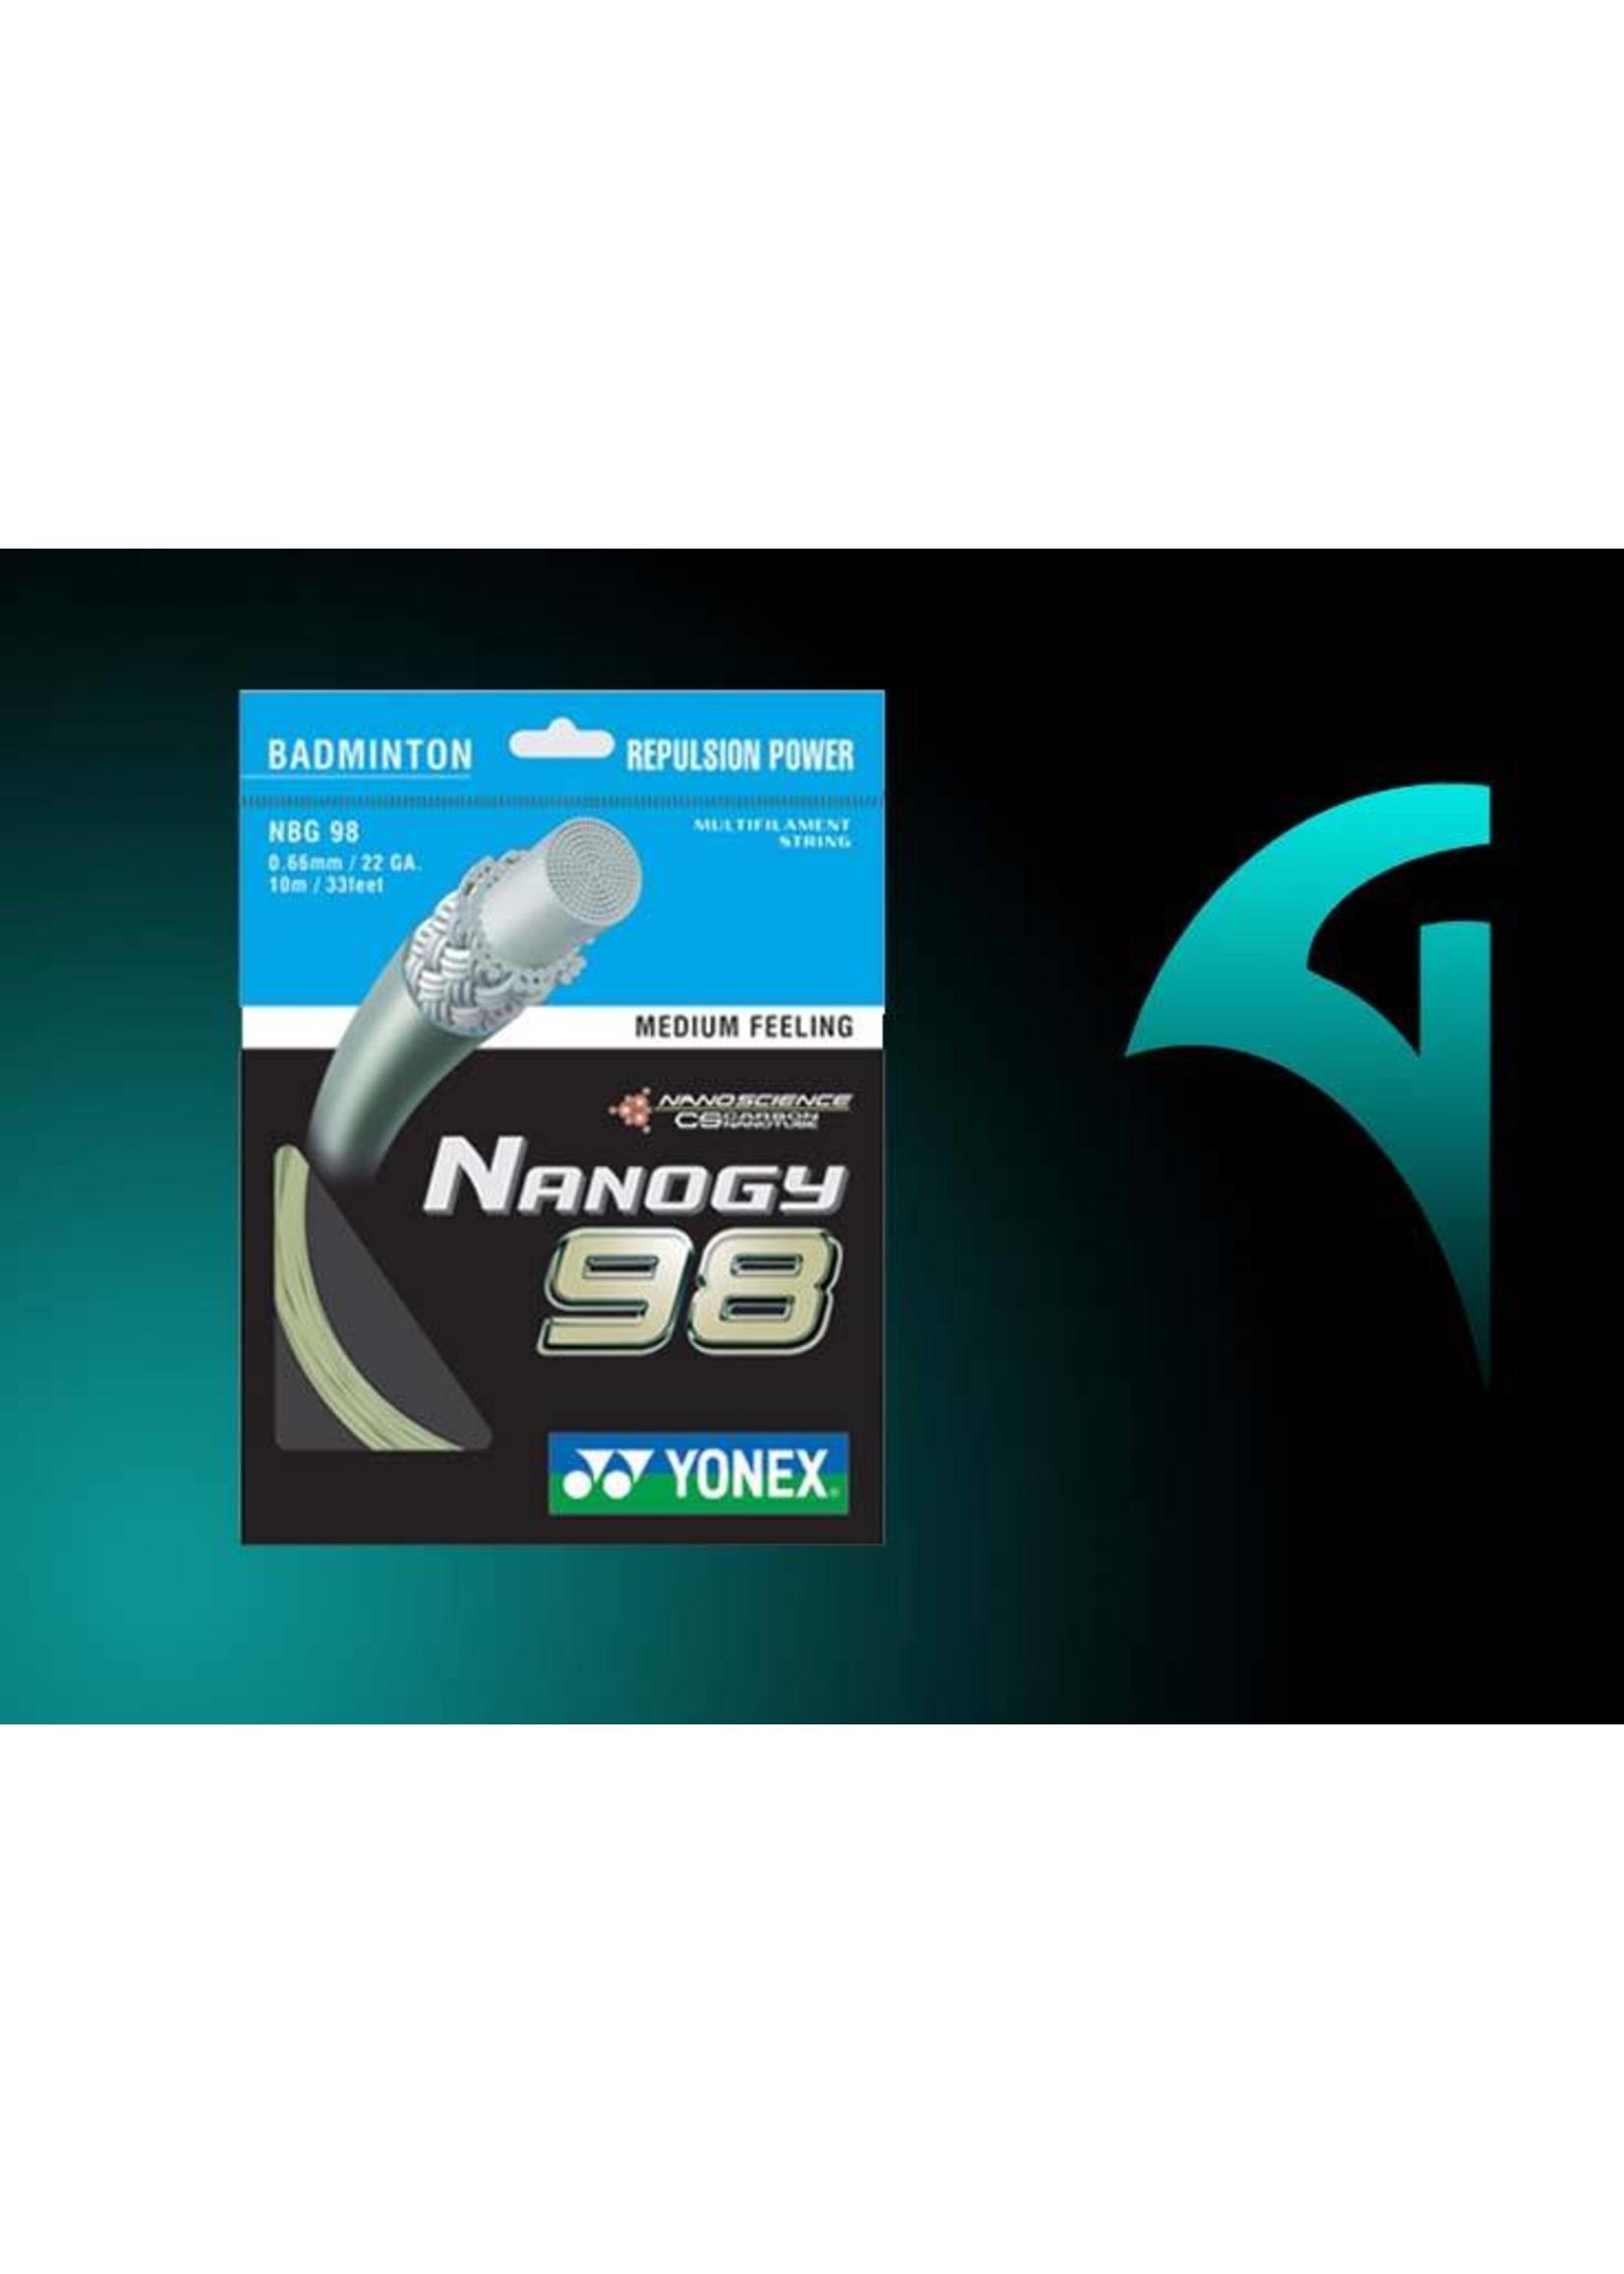 Yonex Nanogy 98 Restring